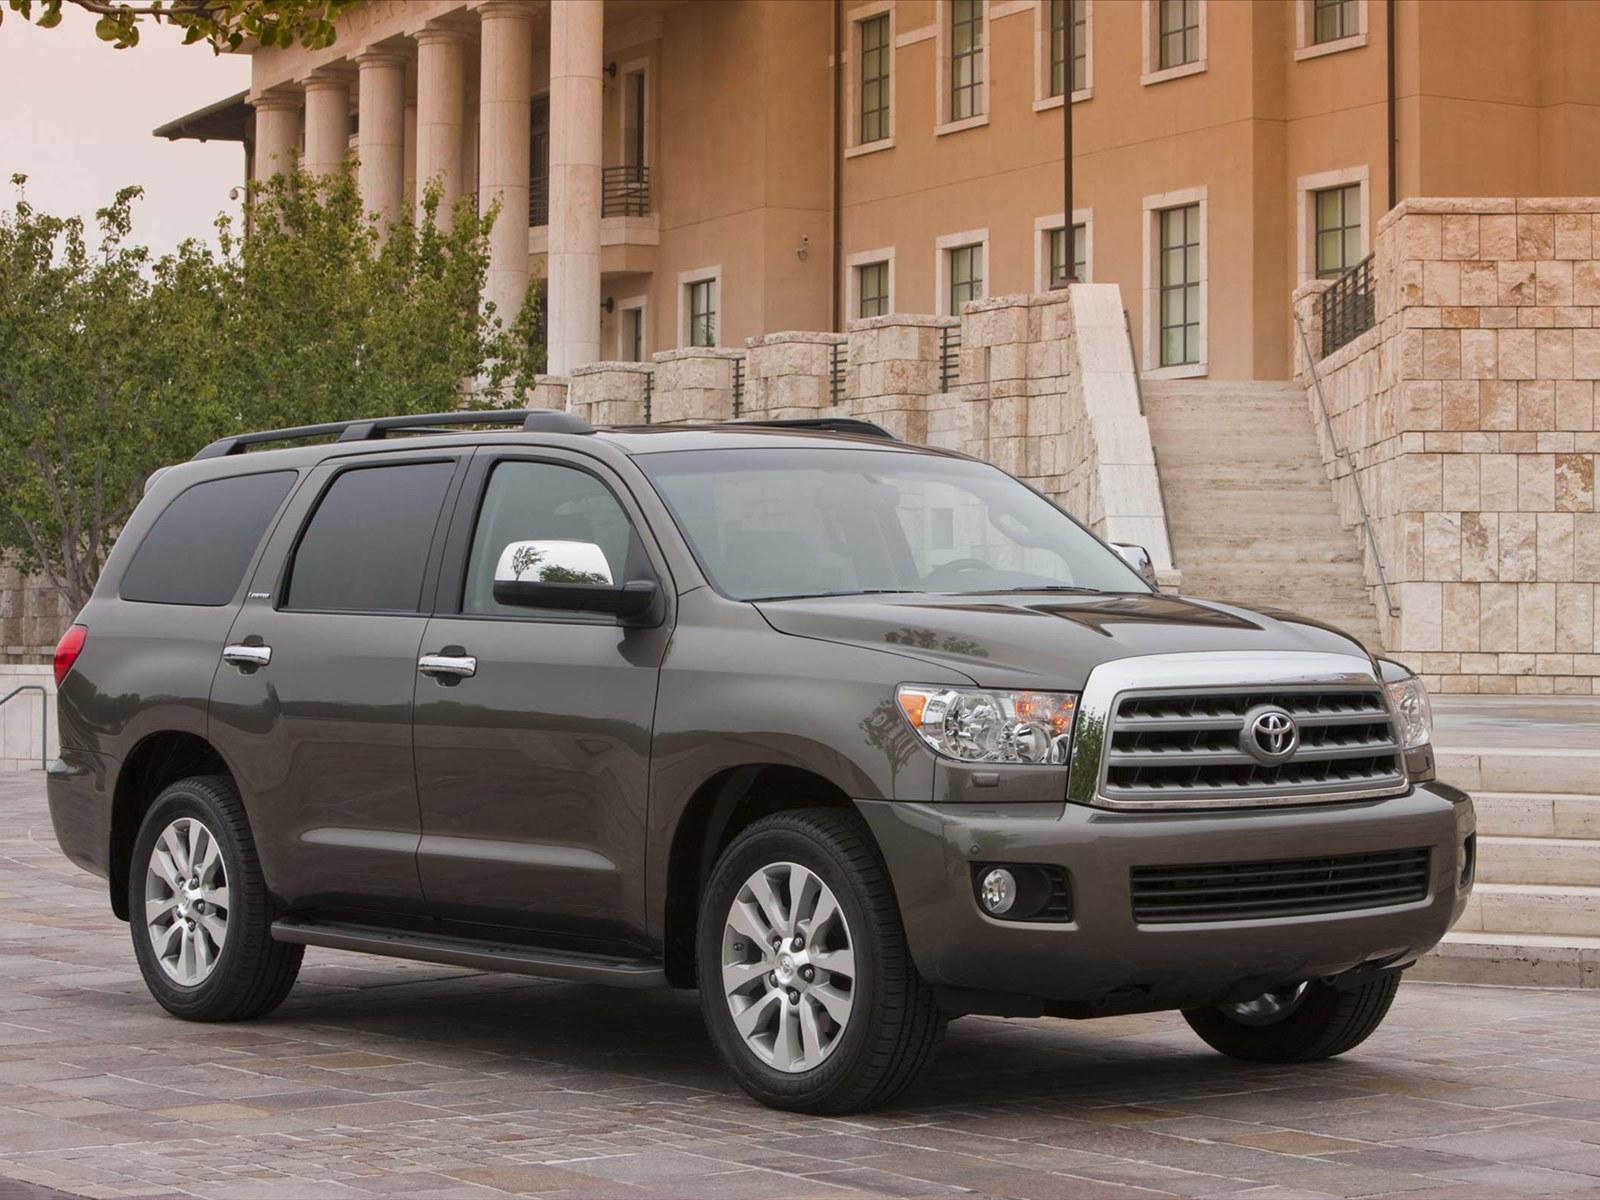 http://4.bp.blogspot.com/_J3_liDBfbvs/TITidmu7mnI/AAAAAAAAygs/aCyiNmGlRRs/s1600/2011+Toyota+Sequoia+Car+Wallpaper.jpg